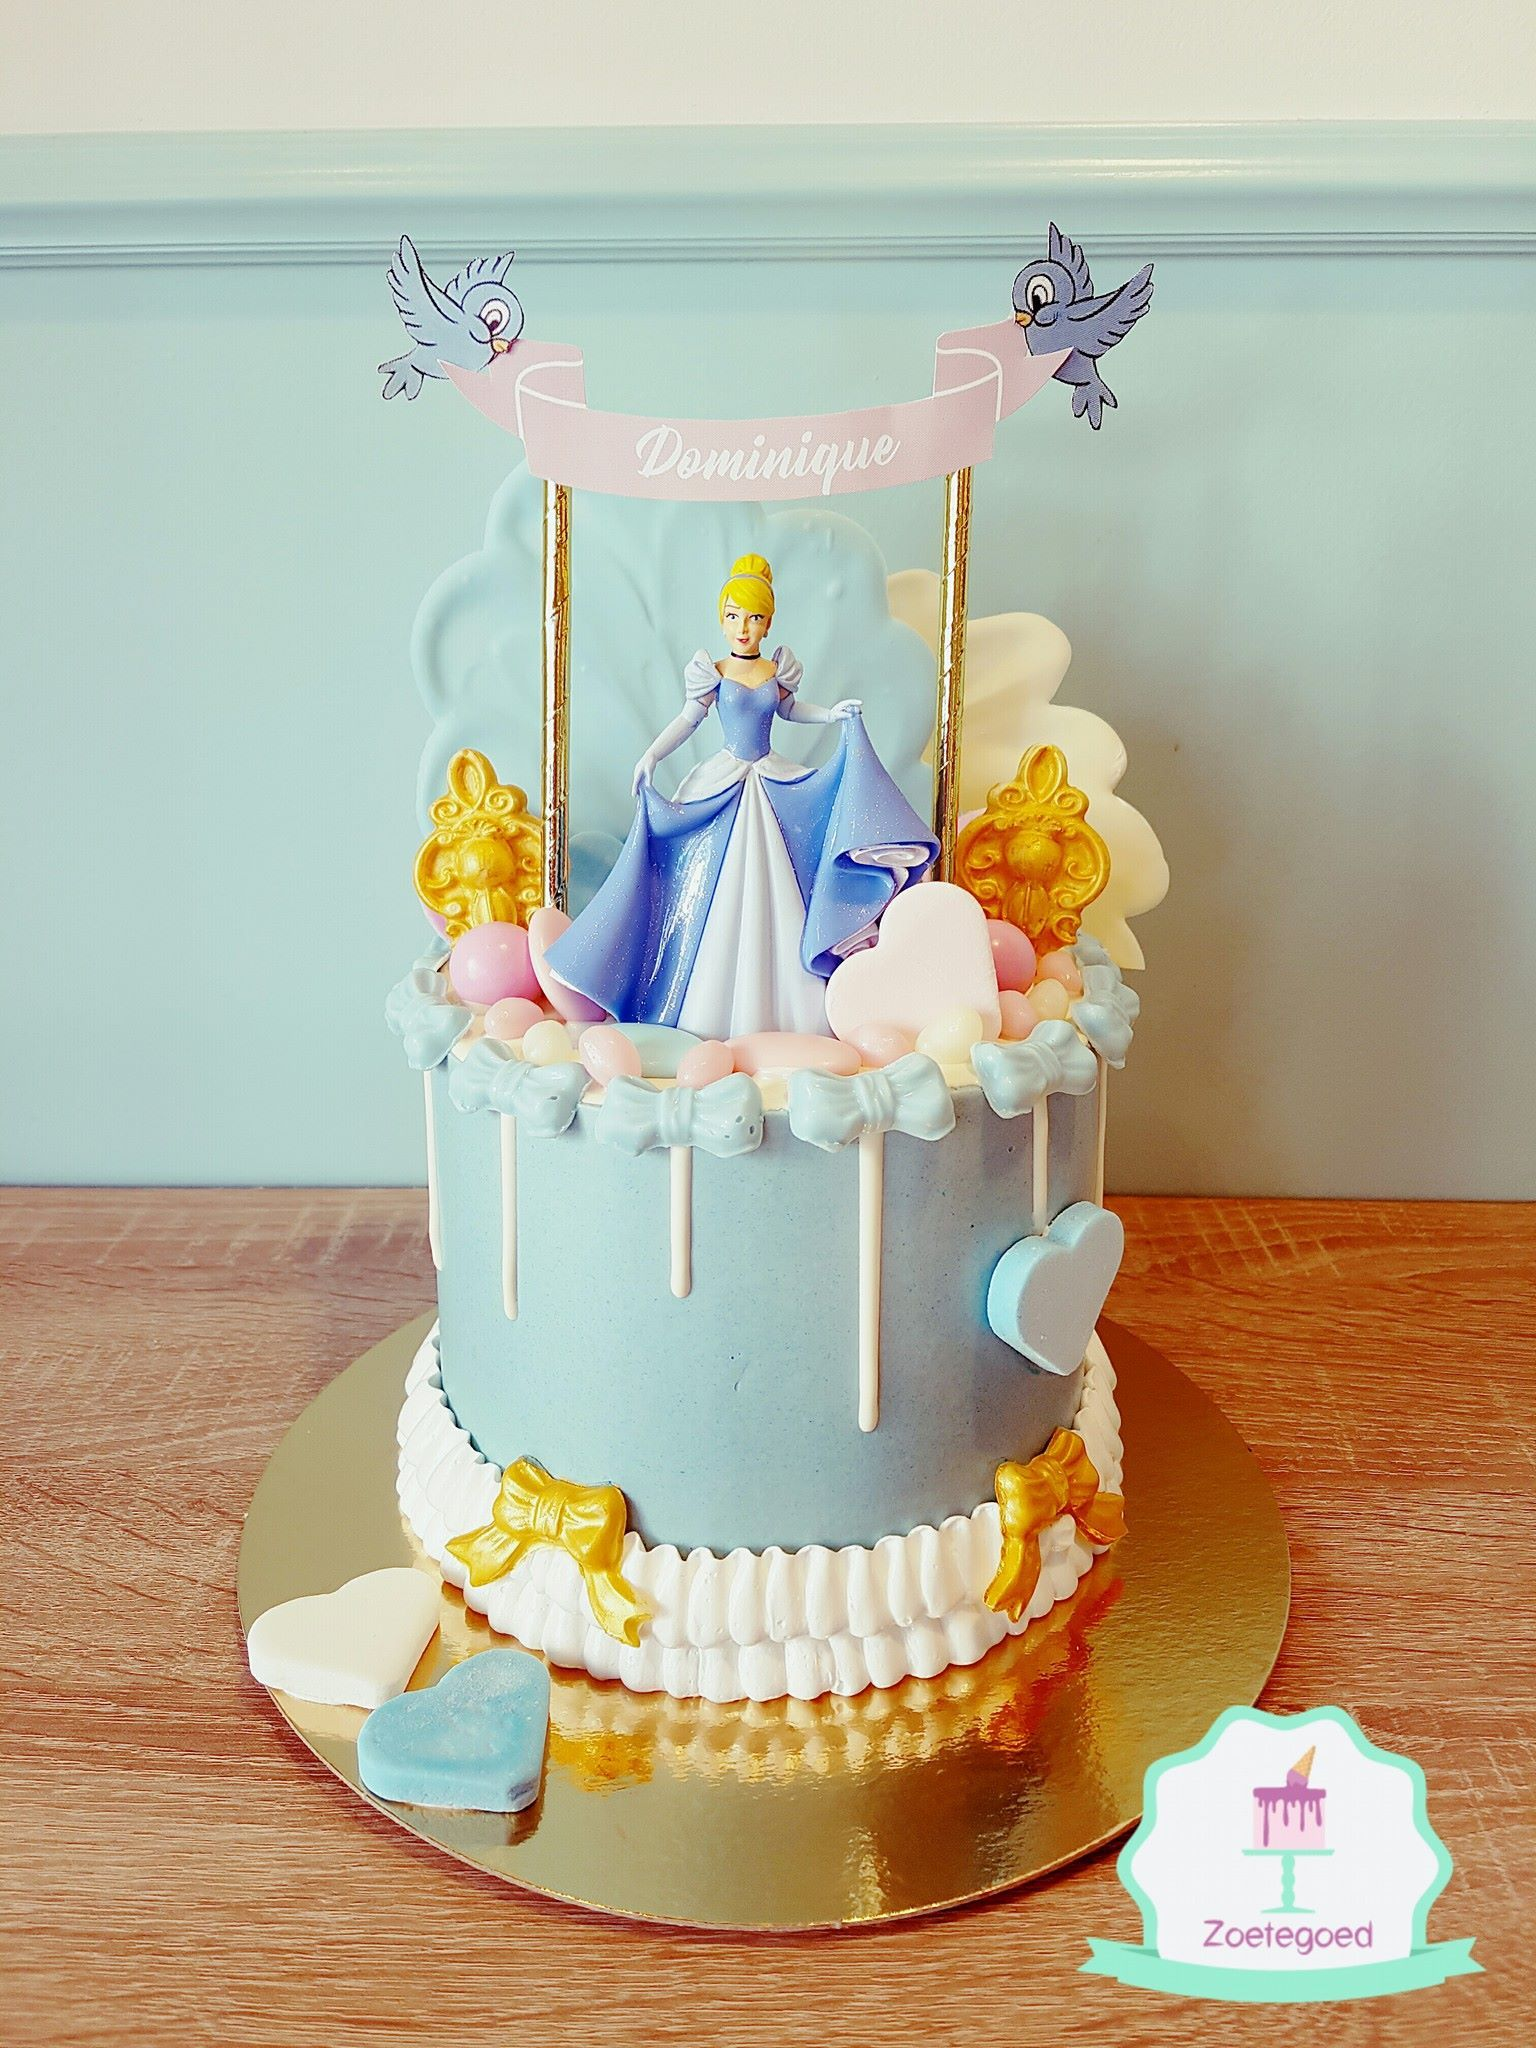 Outstanding Cinderella Disney Drip Cake Cinderella Birthday Cake Cinderella Personalised Birthday Cards Petedlily Jamesorg